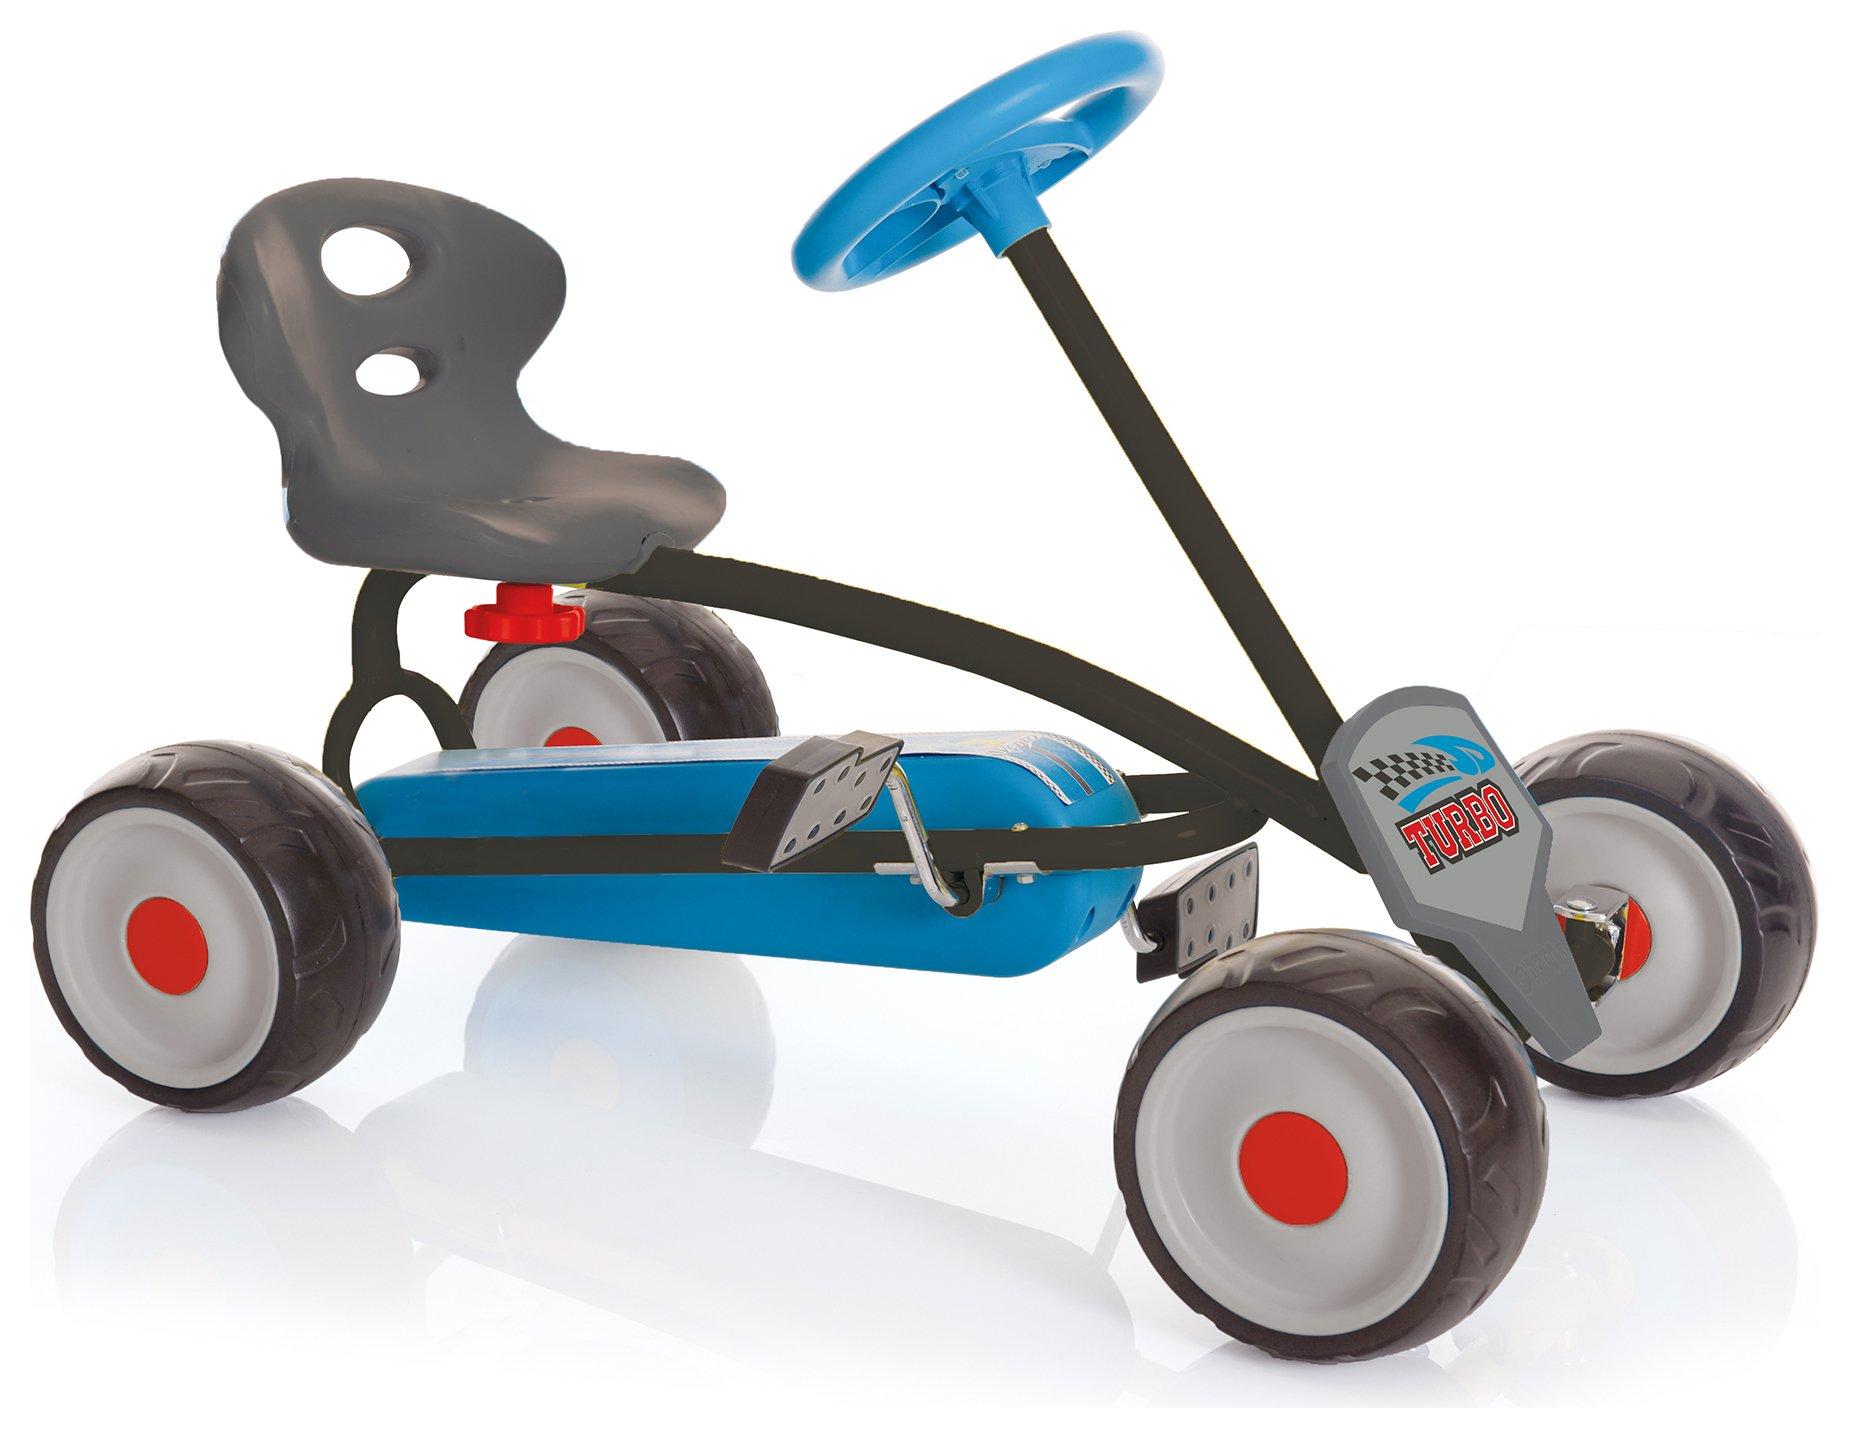 sale on hauck turbo mini go kart blue hauck now. Black Bedroom Furniture Sets. Home Design Ideas